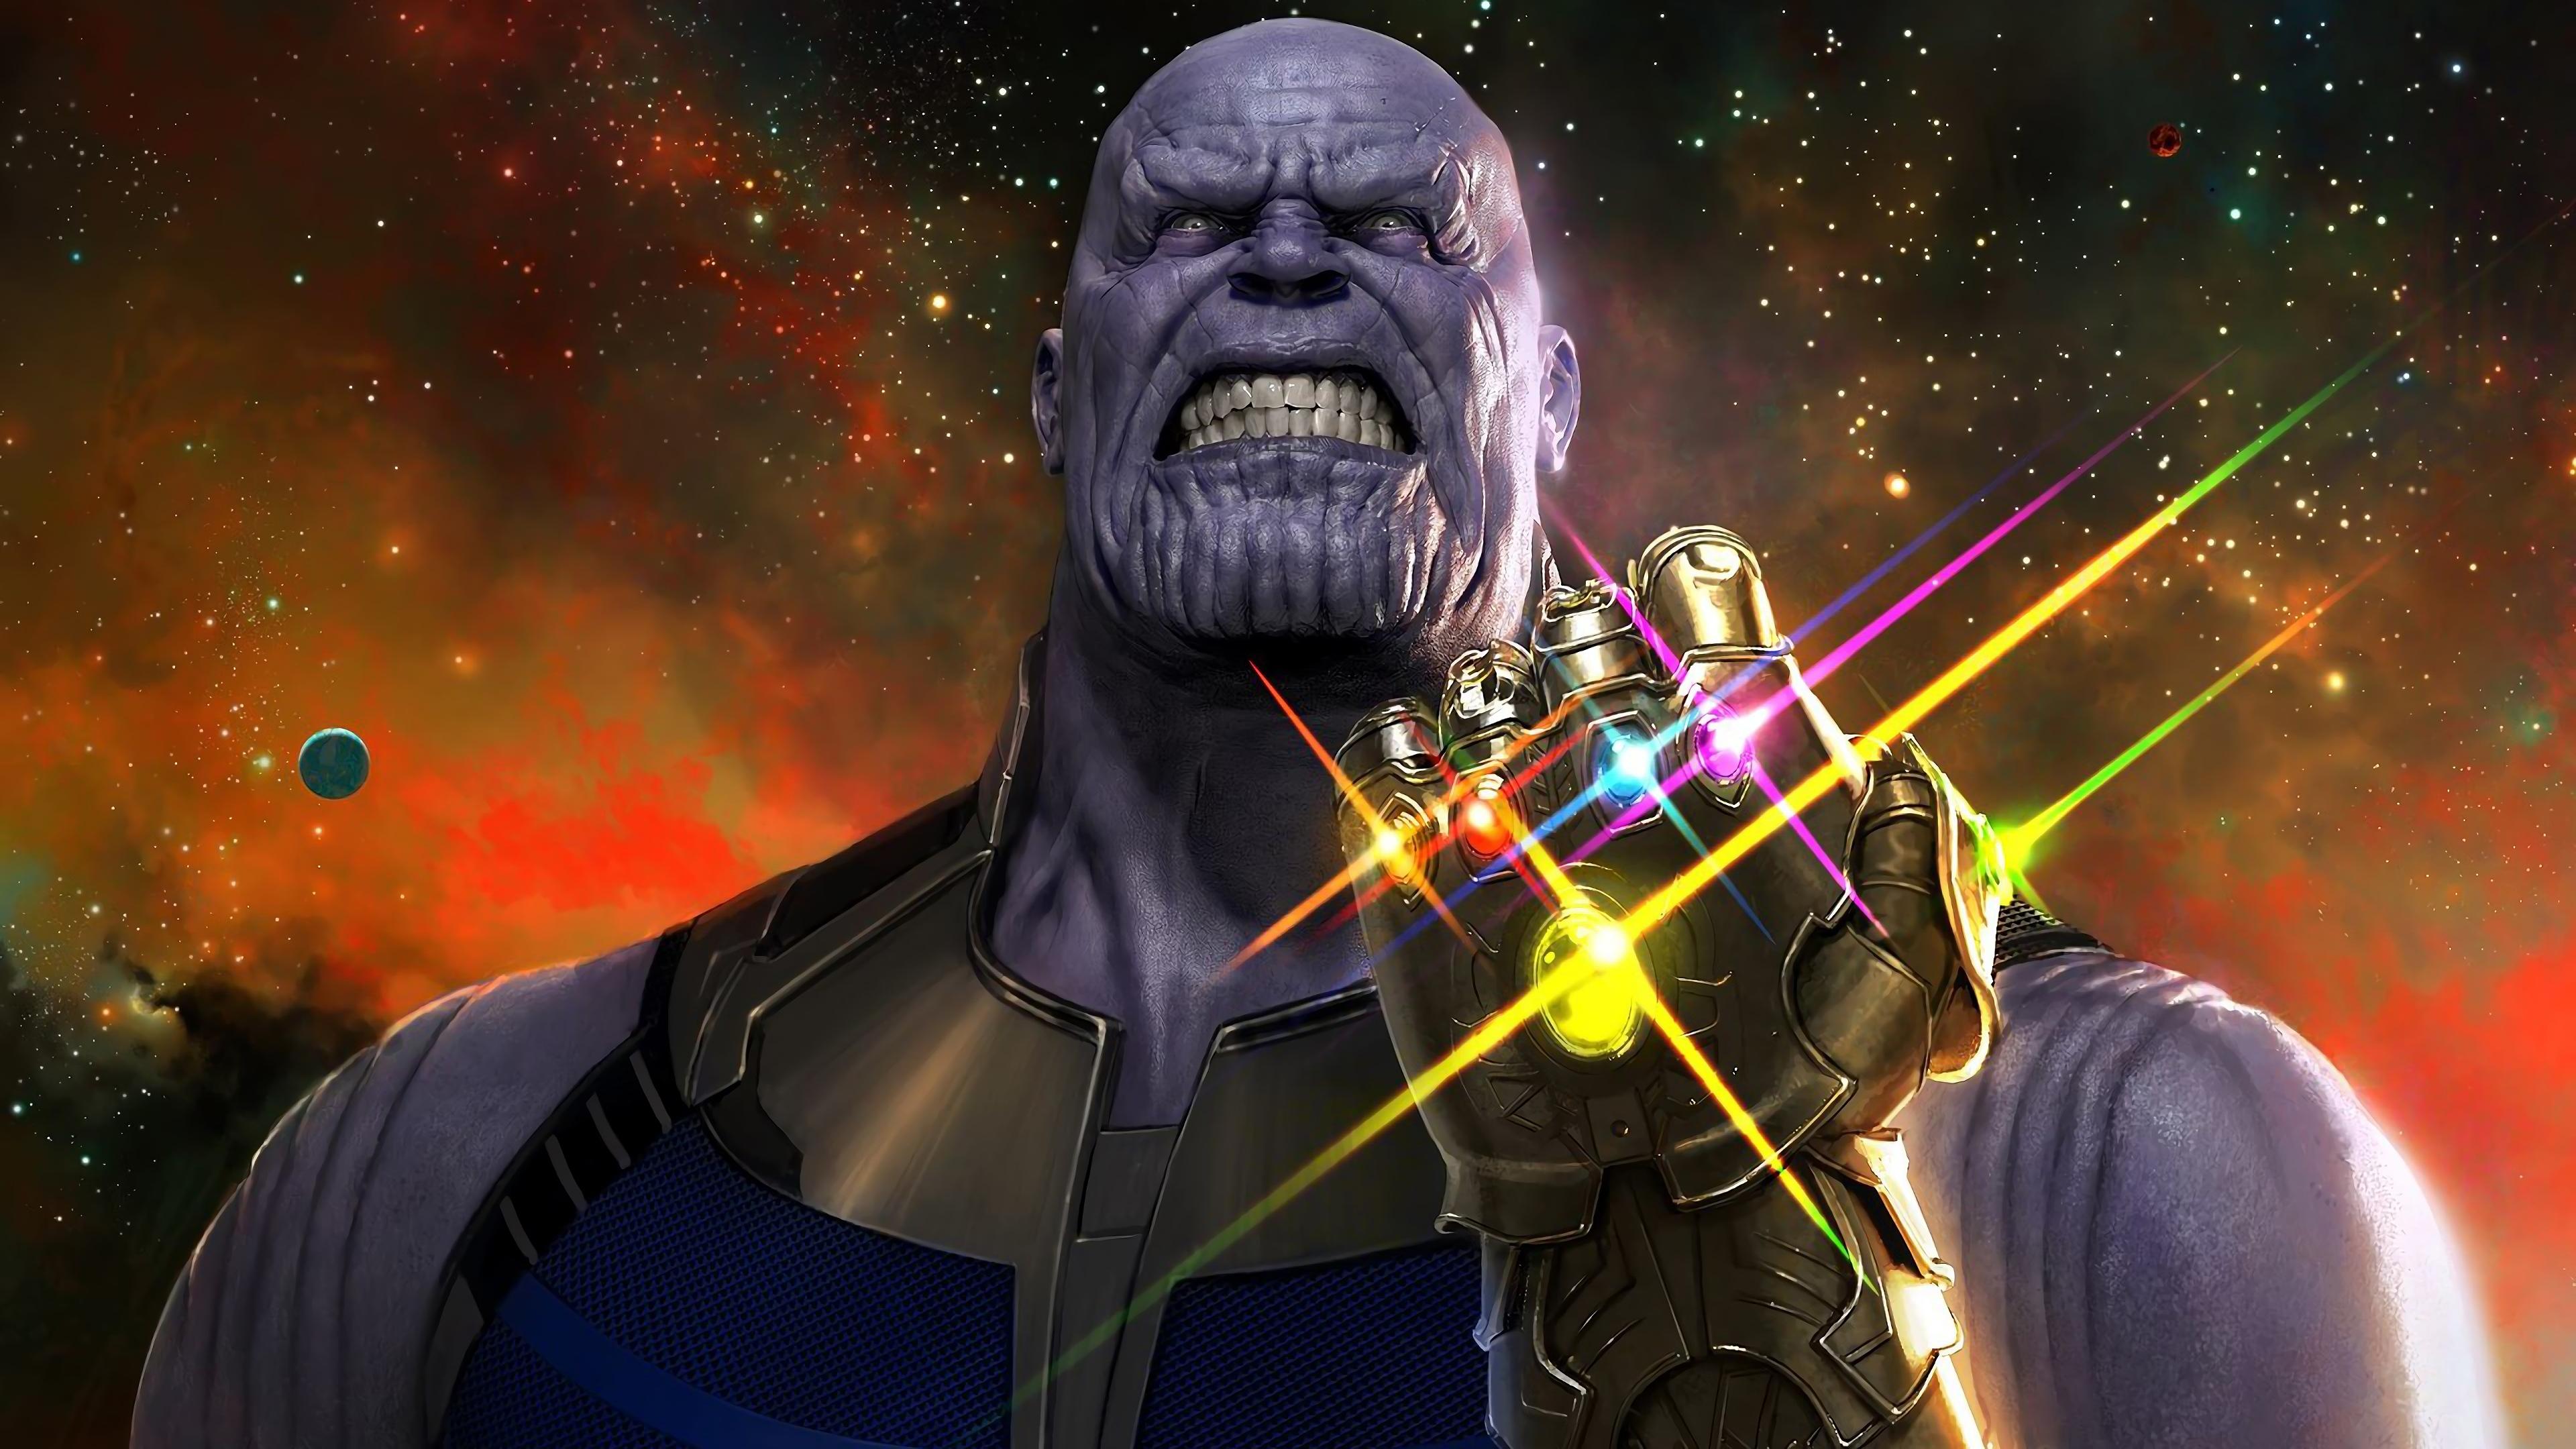 thanos infinity gauntlet avengers infinity war 4k 1547507404 - Thanos Infinity Gauntlet Avengers: Infinity War 4k - Thanos, Avengers Infinity War